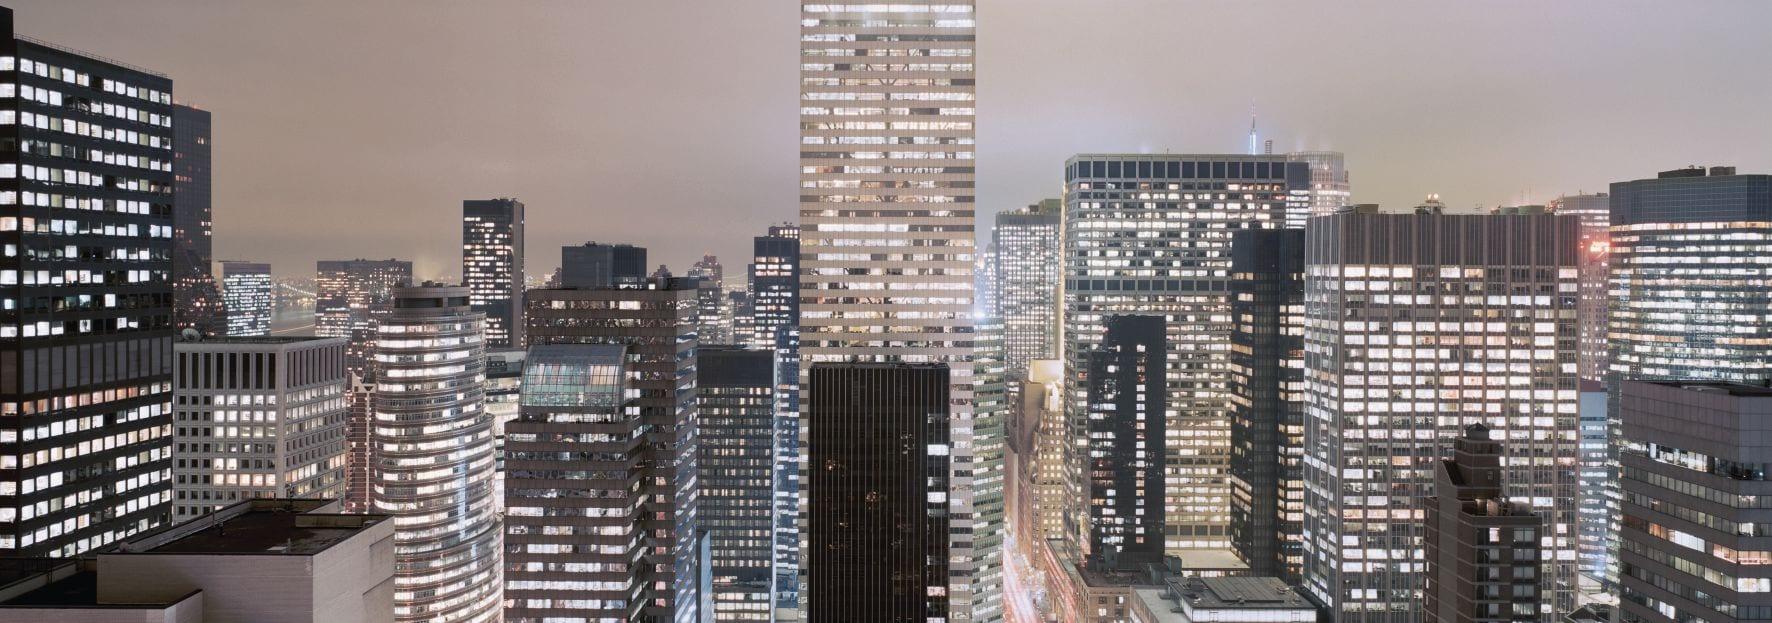 Fotomural Manhattan Metropolitan 4258 Komar